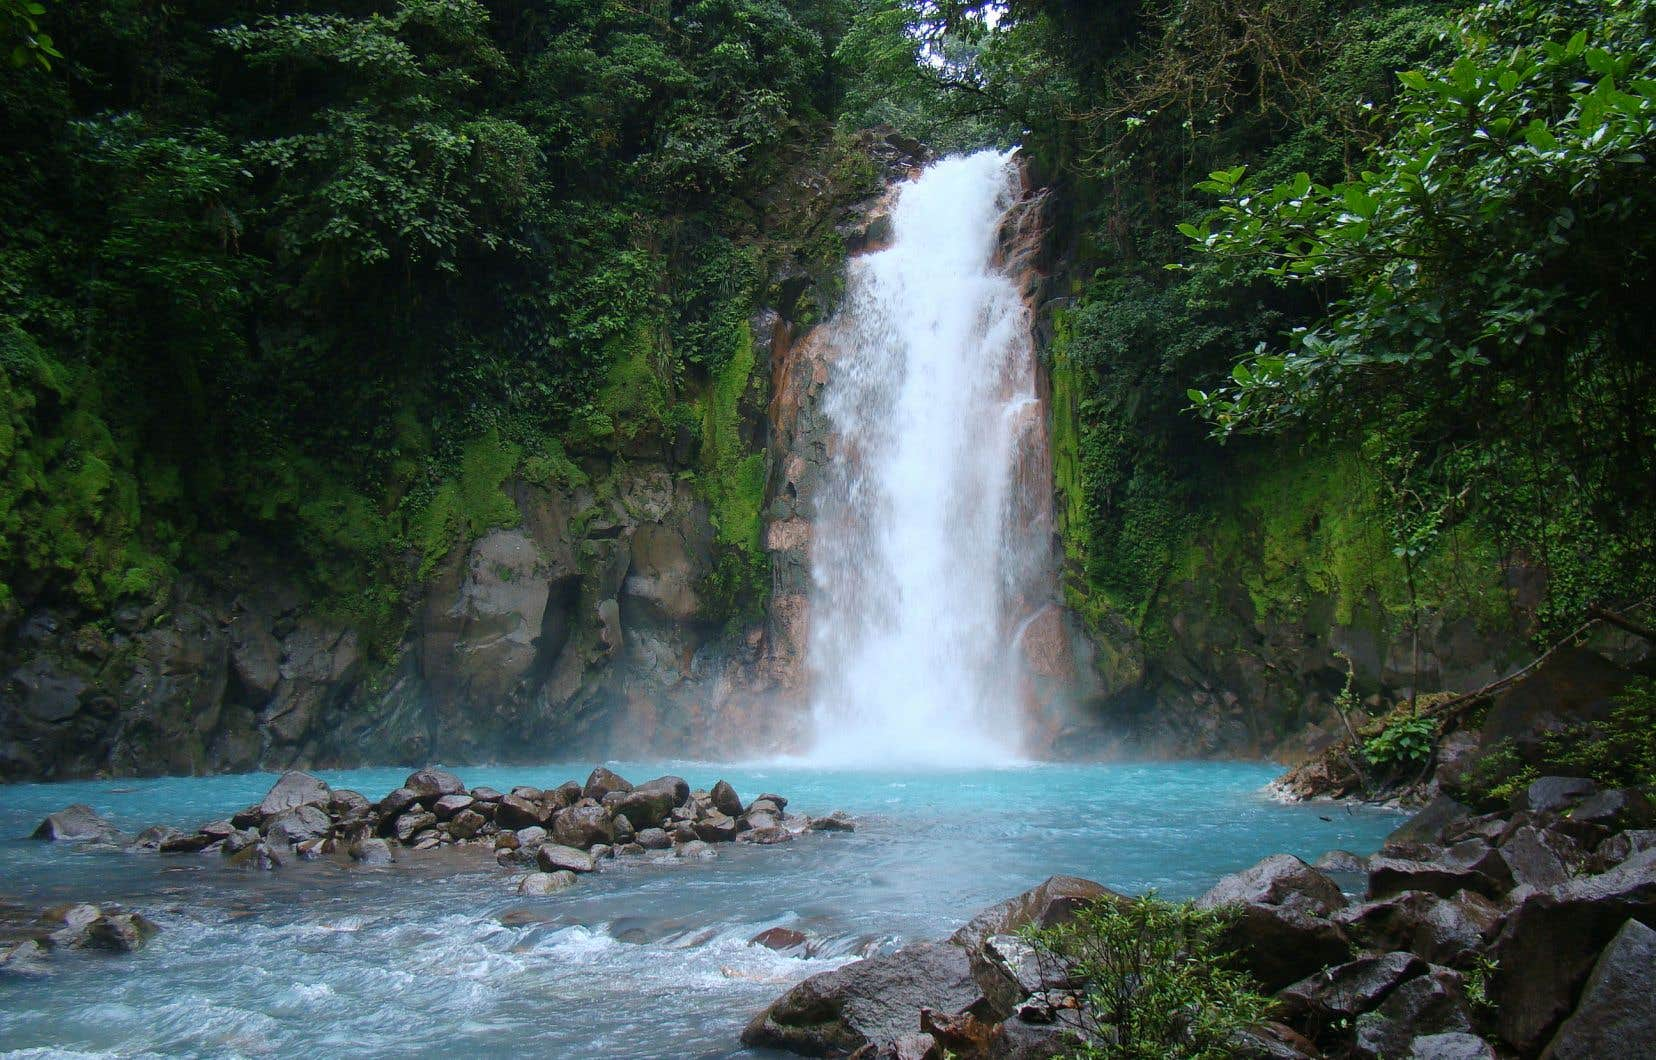 Le Costa Rica abrite à lui seul 6% de la biodiversité mondiale.